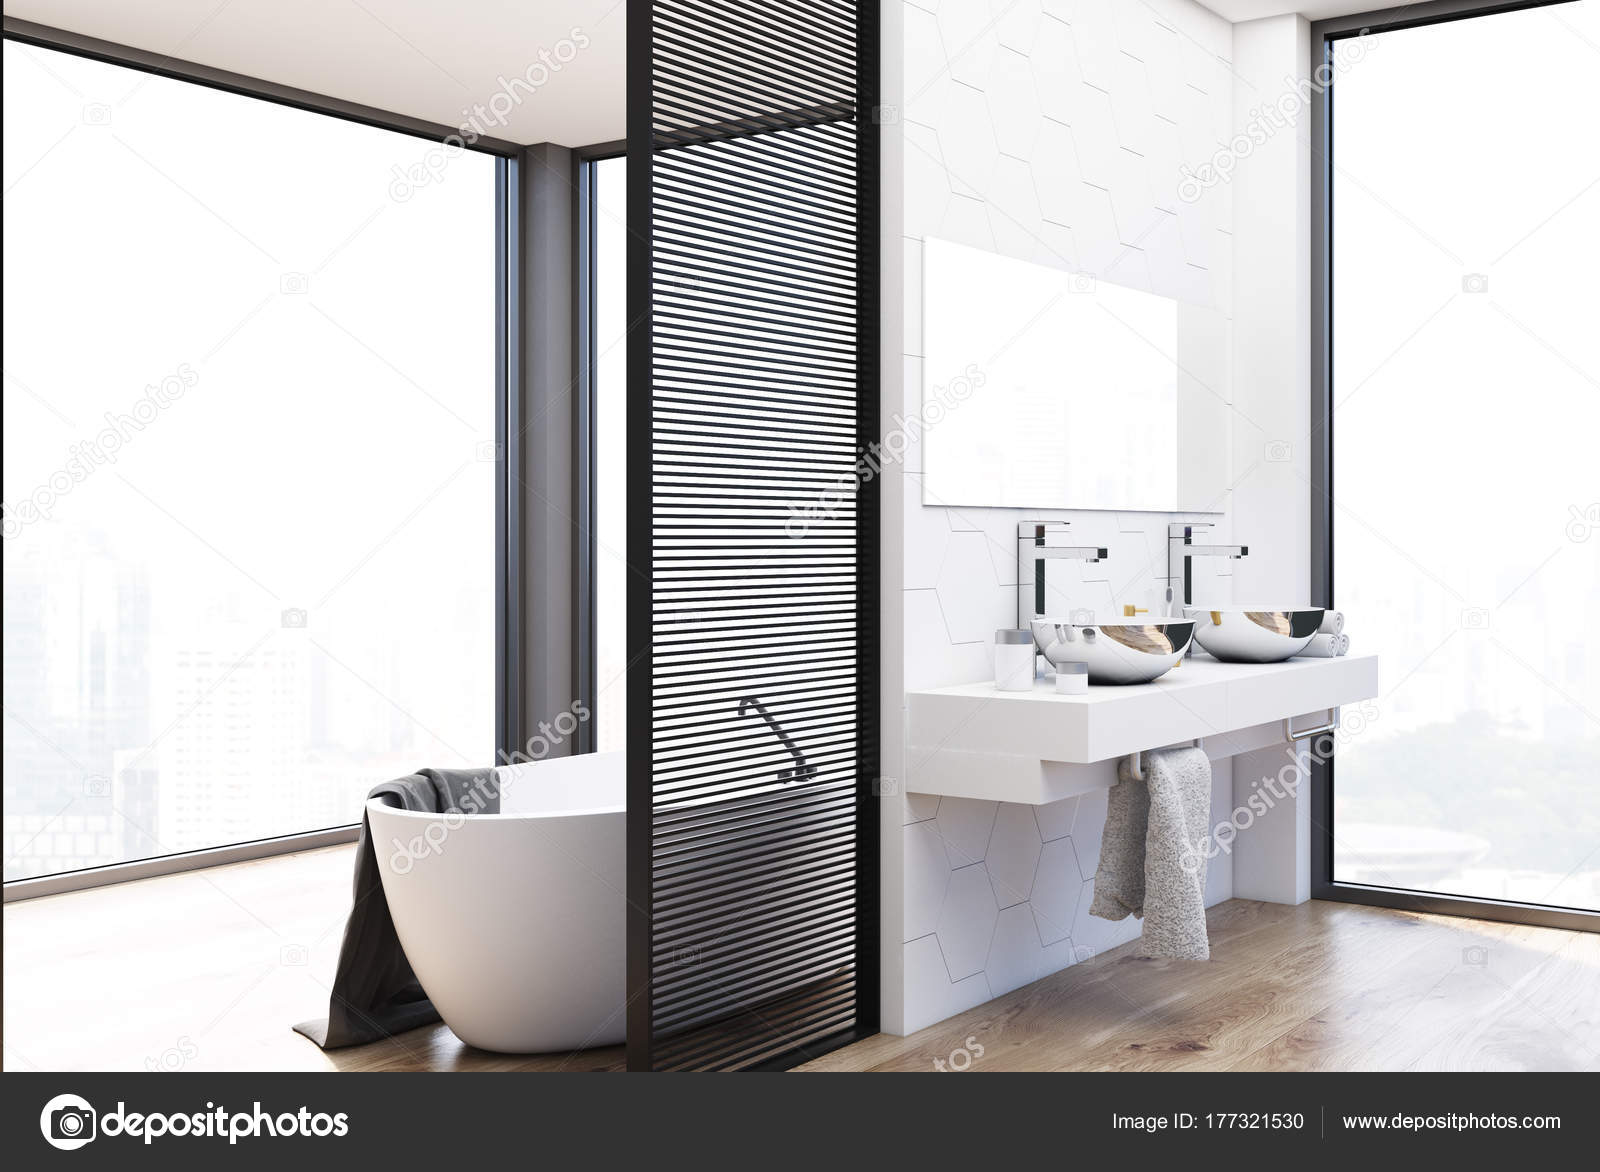 Hexagon Tegels Badkamer : Hexagon tegels badkamer dubbele wastafel en bad u stockfoto